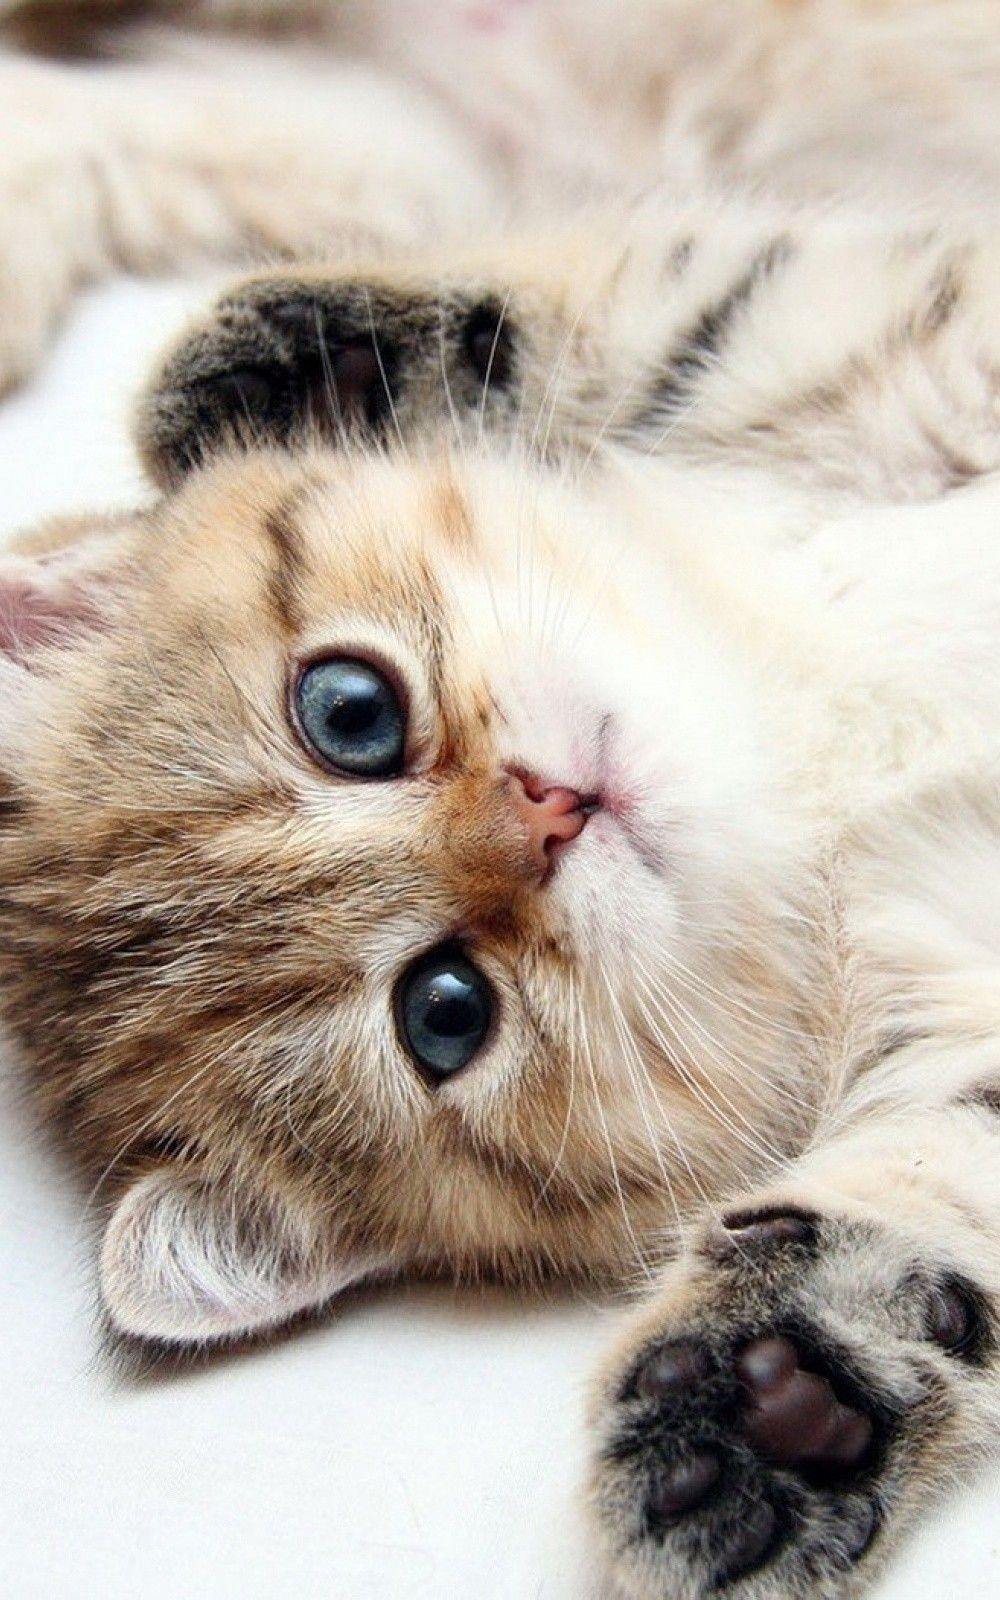 cutest cats - my garden | hd wallpaper iphone, blue eyes and cat